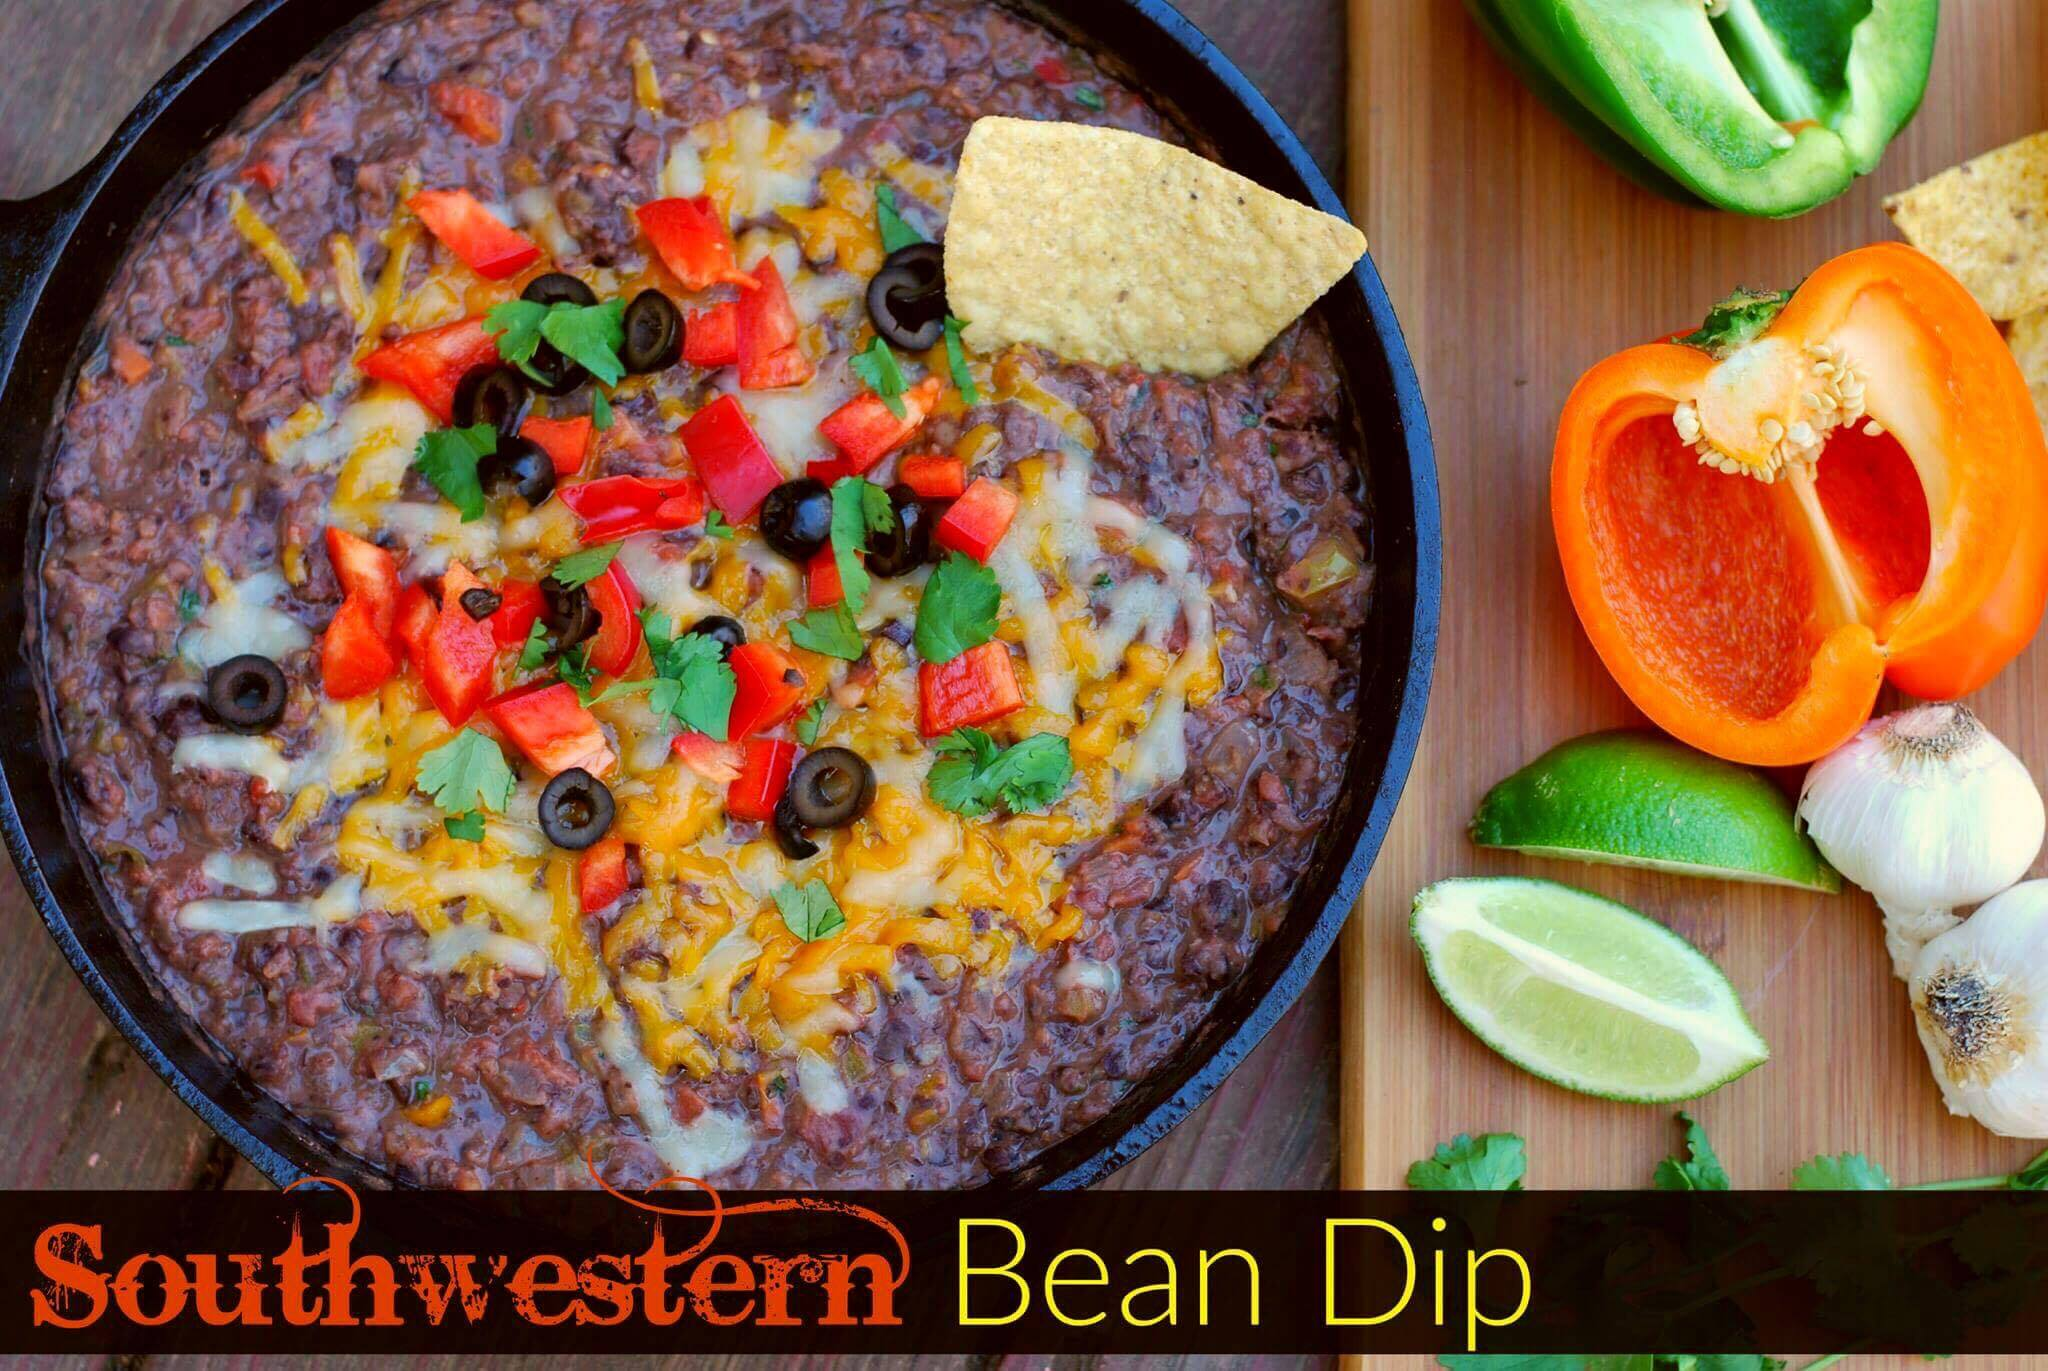 Southwestern Bean Dip